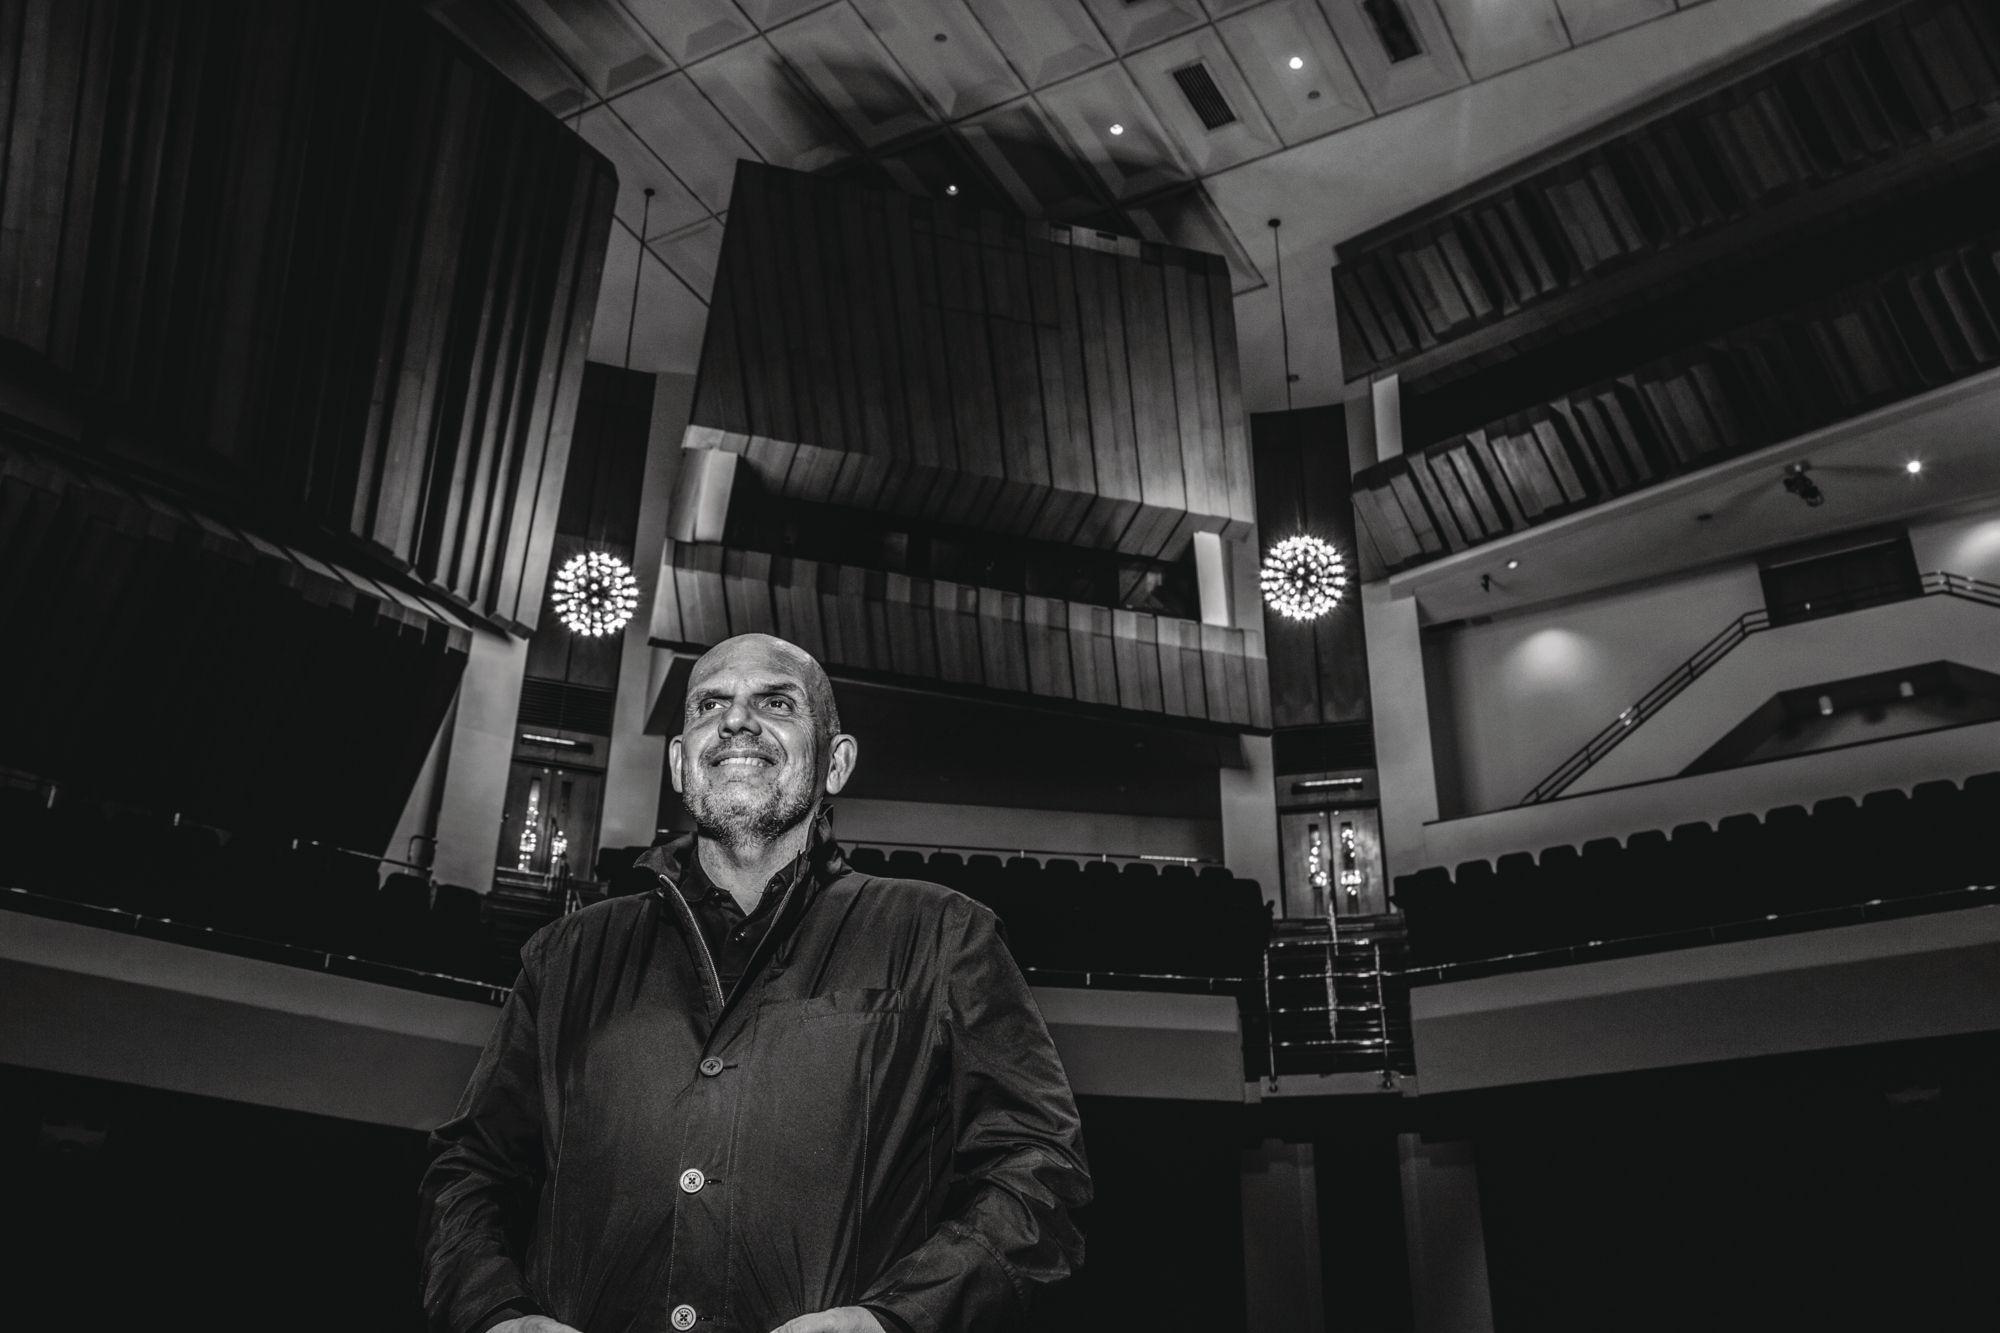 Jaap van Zweden, music director of the Hong Kong Philharmonic Orchestra (Photo: Michaela Giles for Tatler Hong Kong)